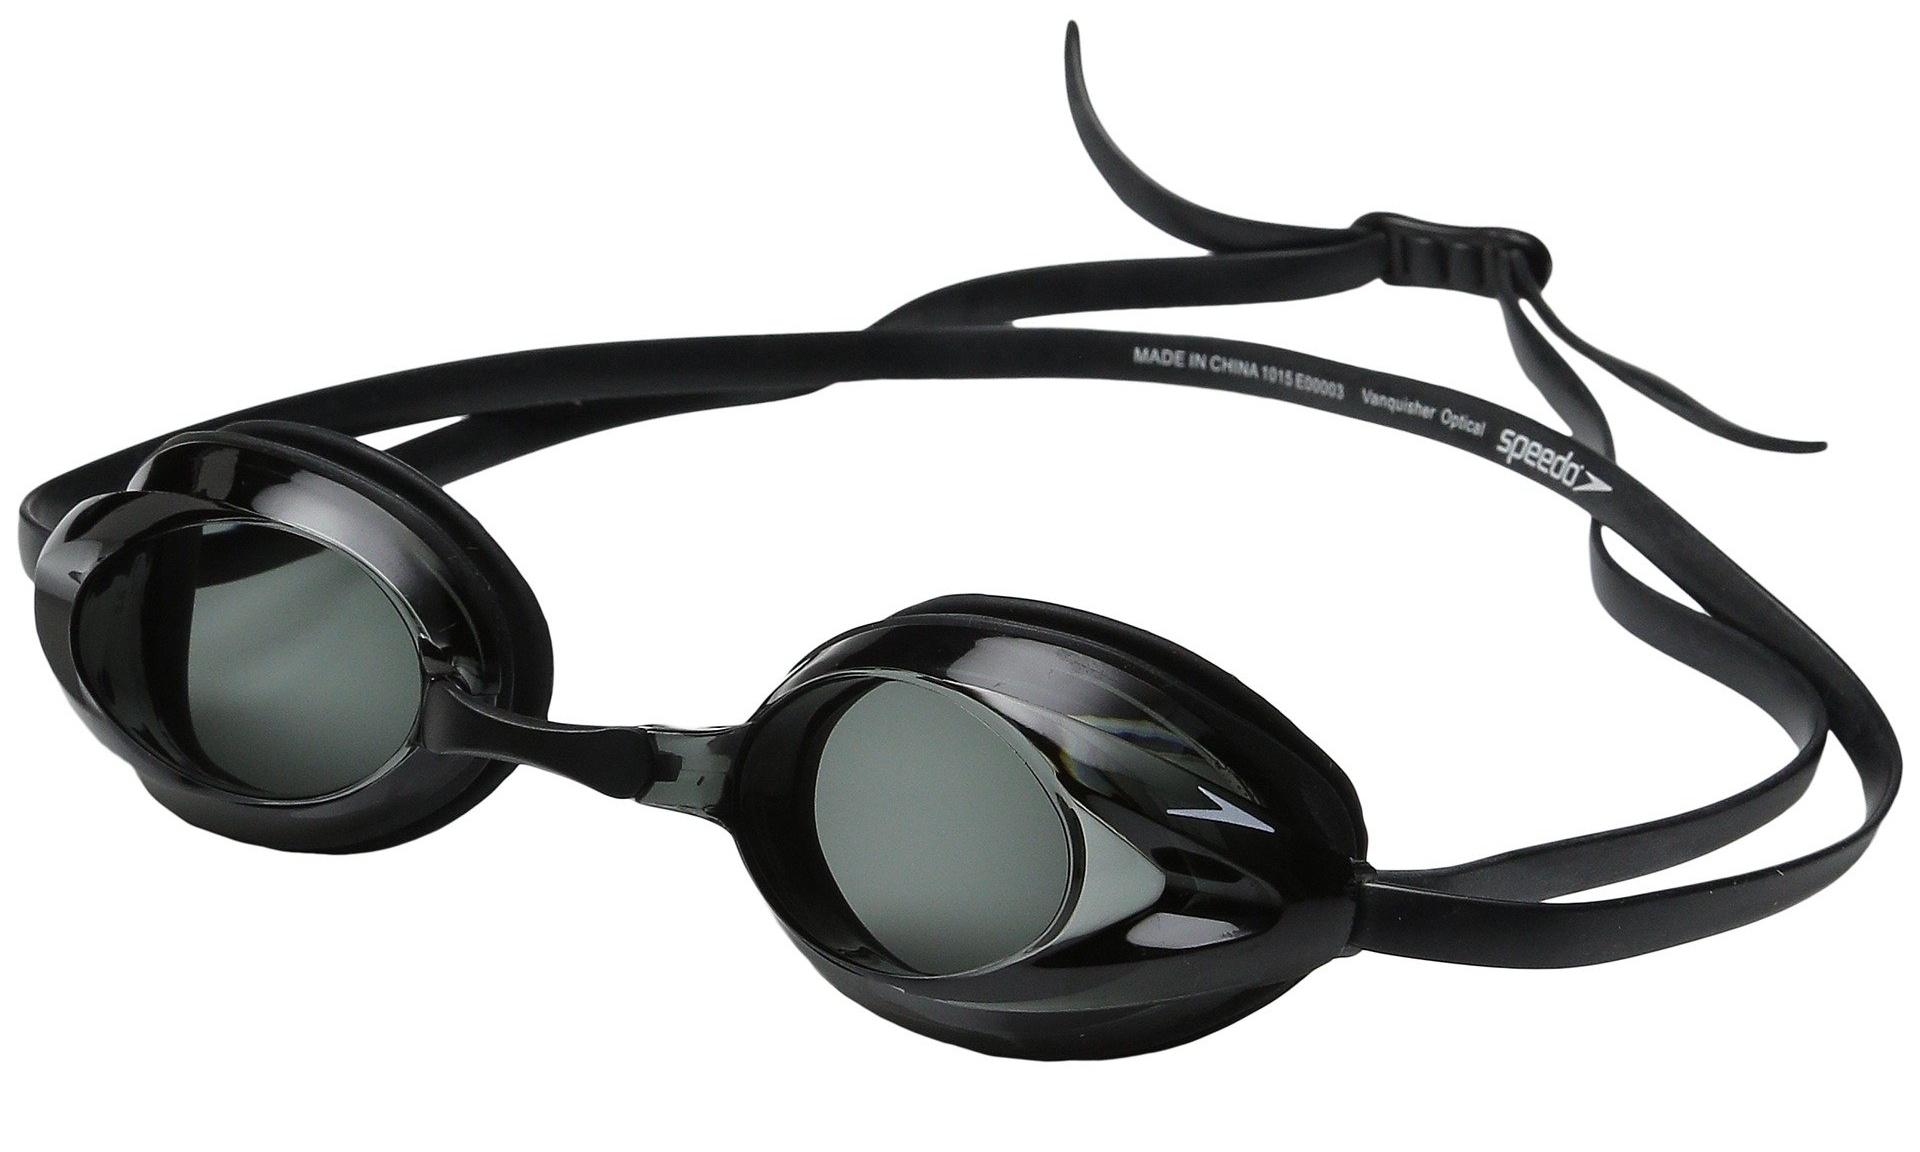 a3da767d206d Speedo Vanquisher Optical Competition Swim Swimming Goggles Smoke ...